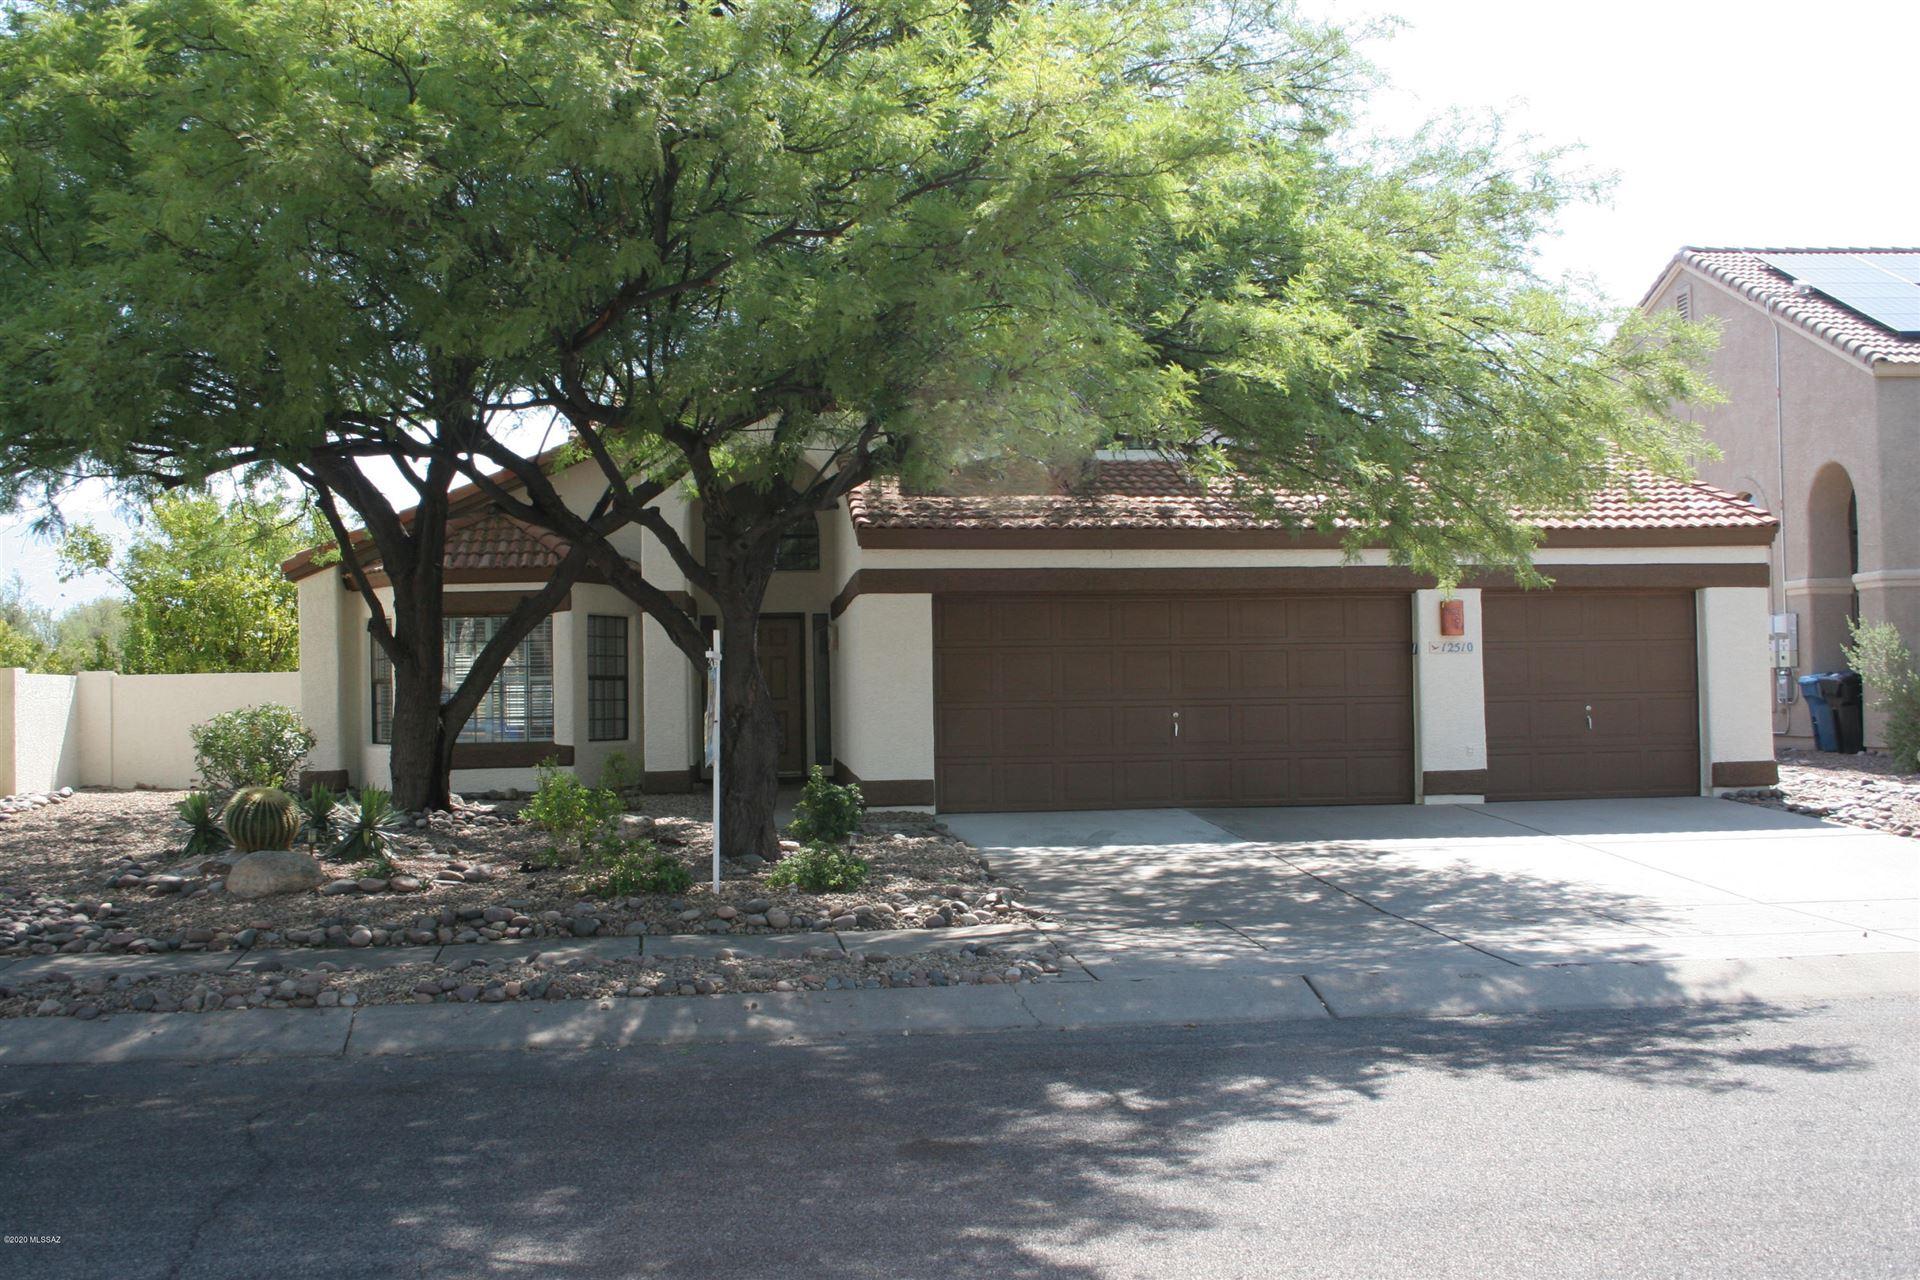 12510 N Lantern Way, Oro Valley, AZ 85755 - MLS#: 22013170